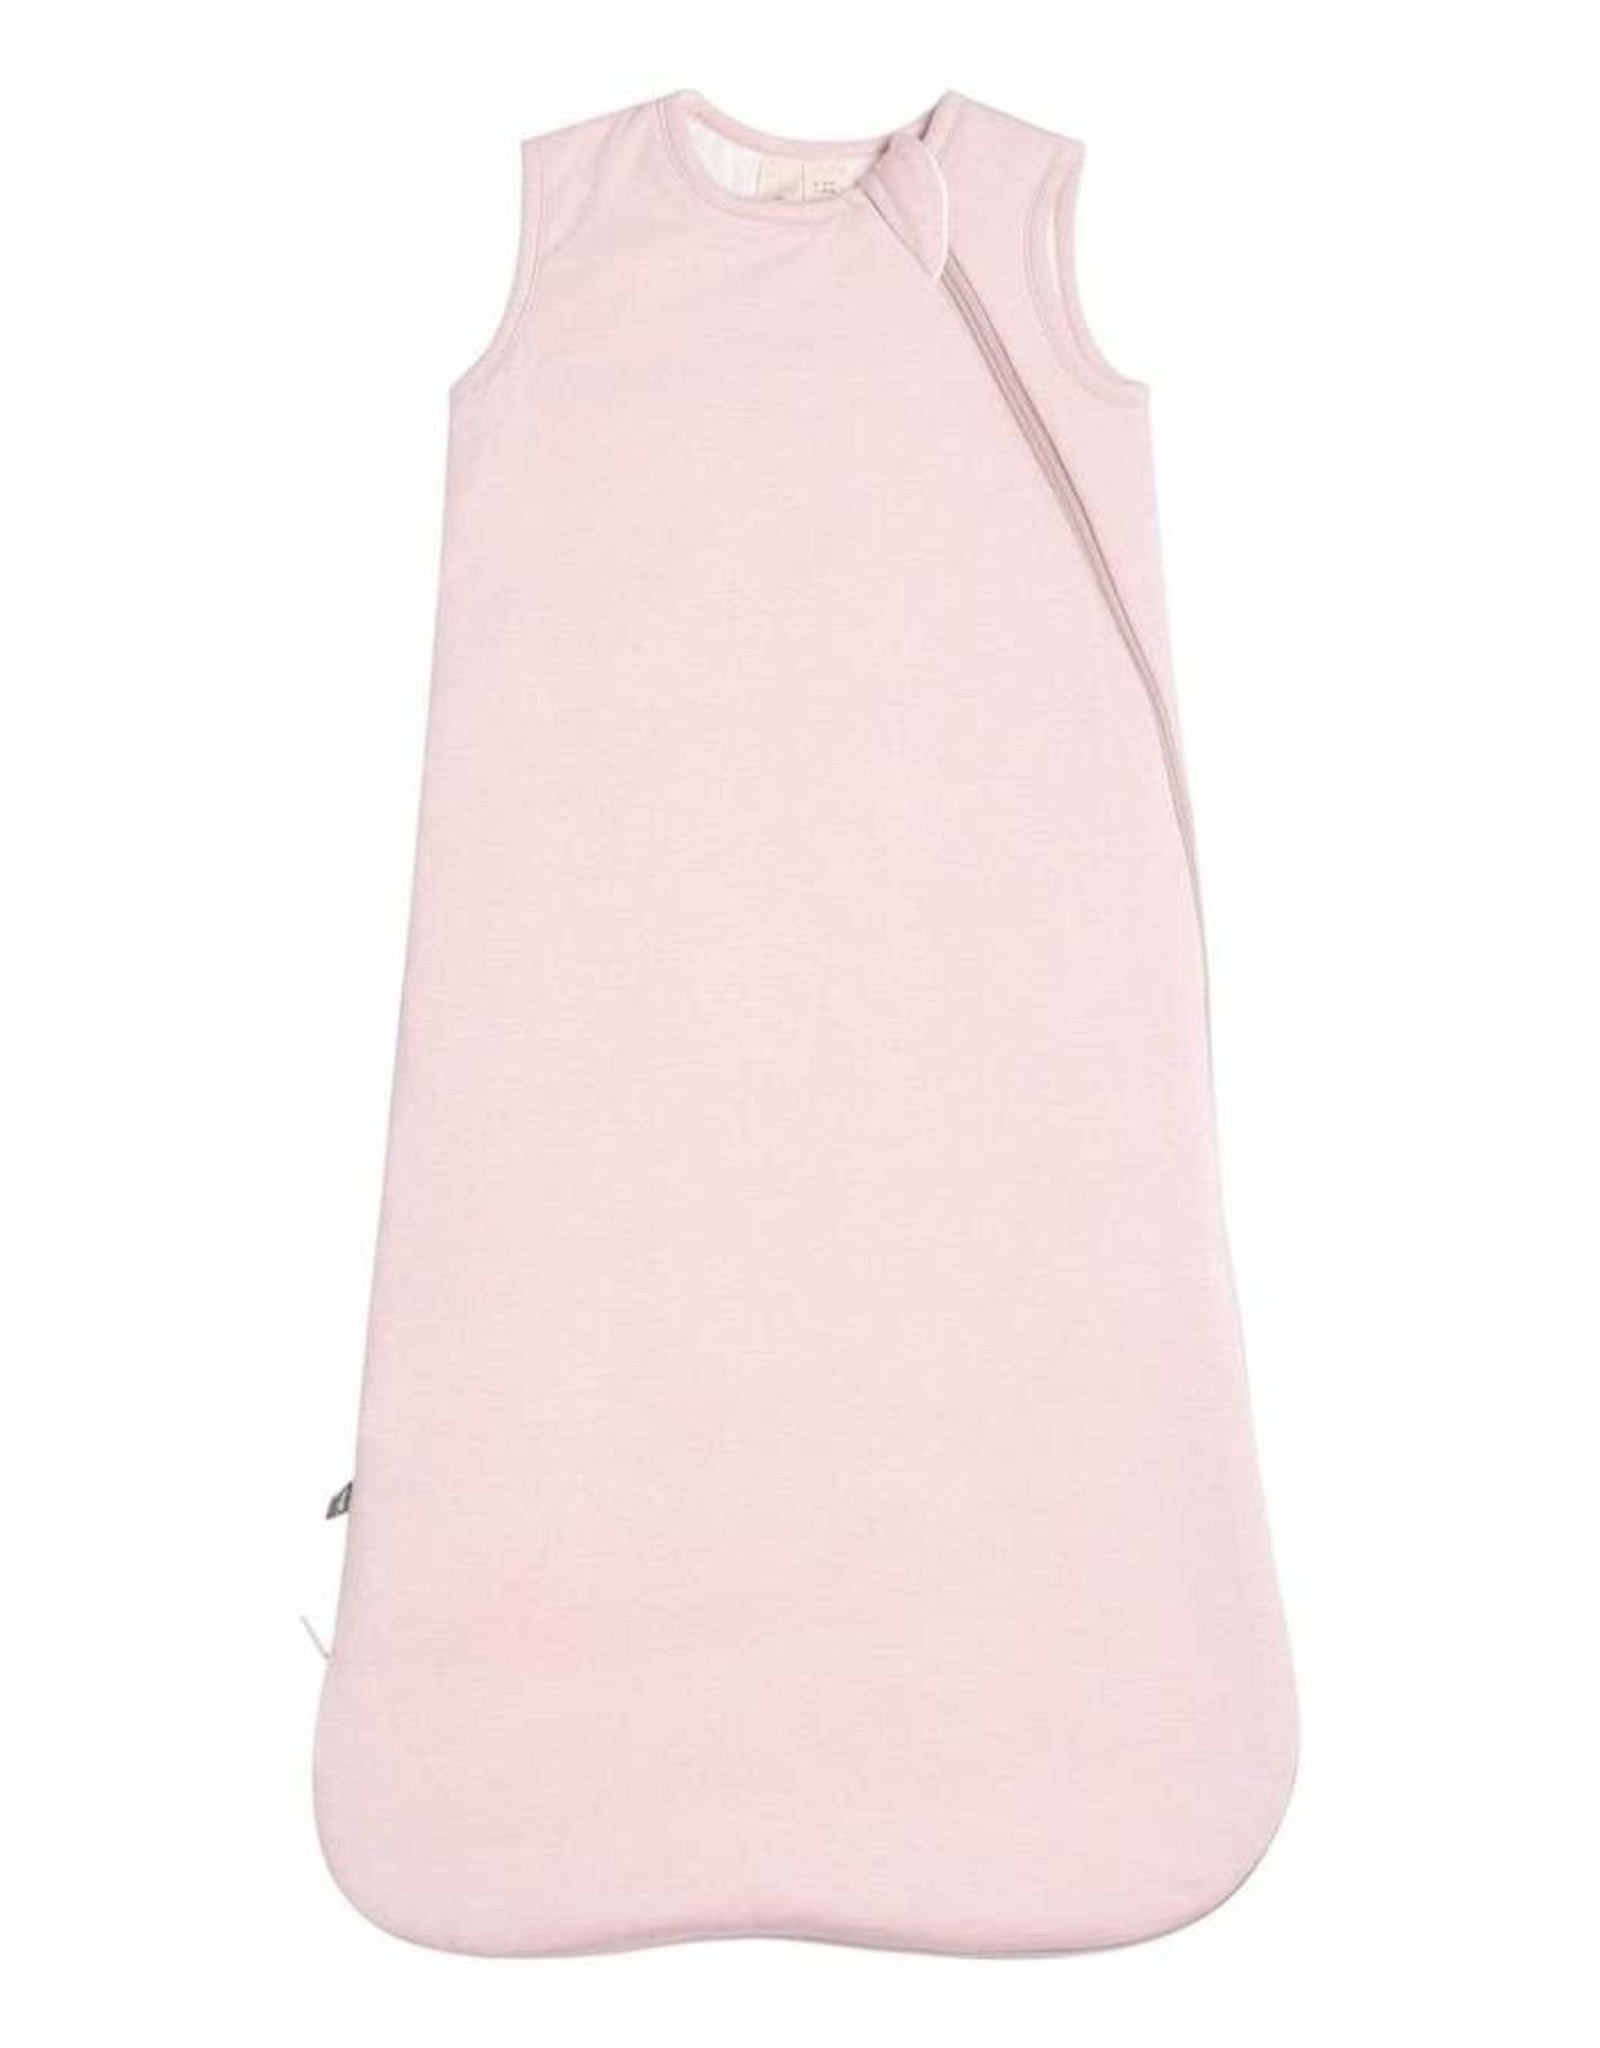 Kyte Baby sleep bag 1.0 (18-36m)- blush